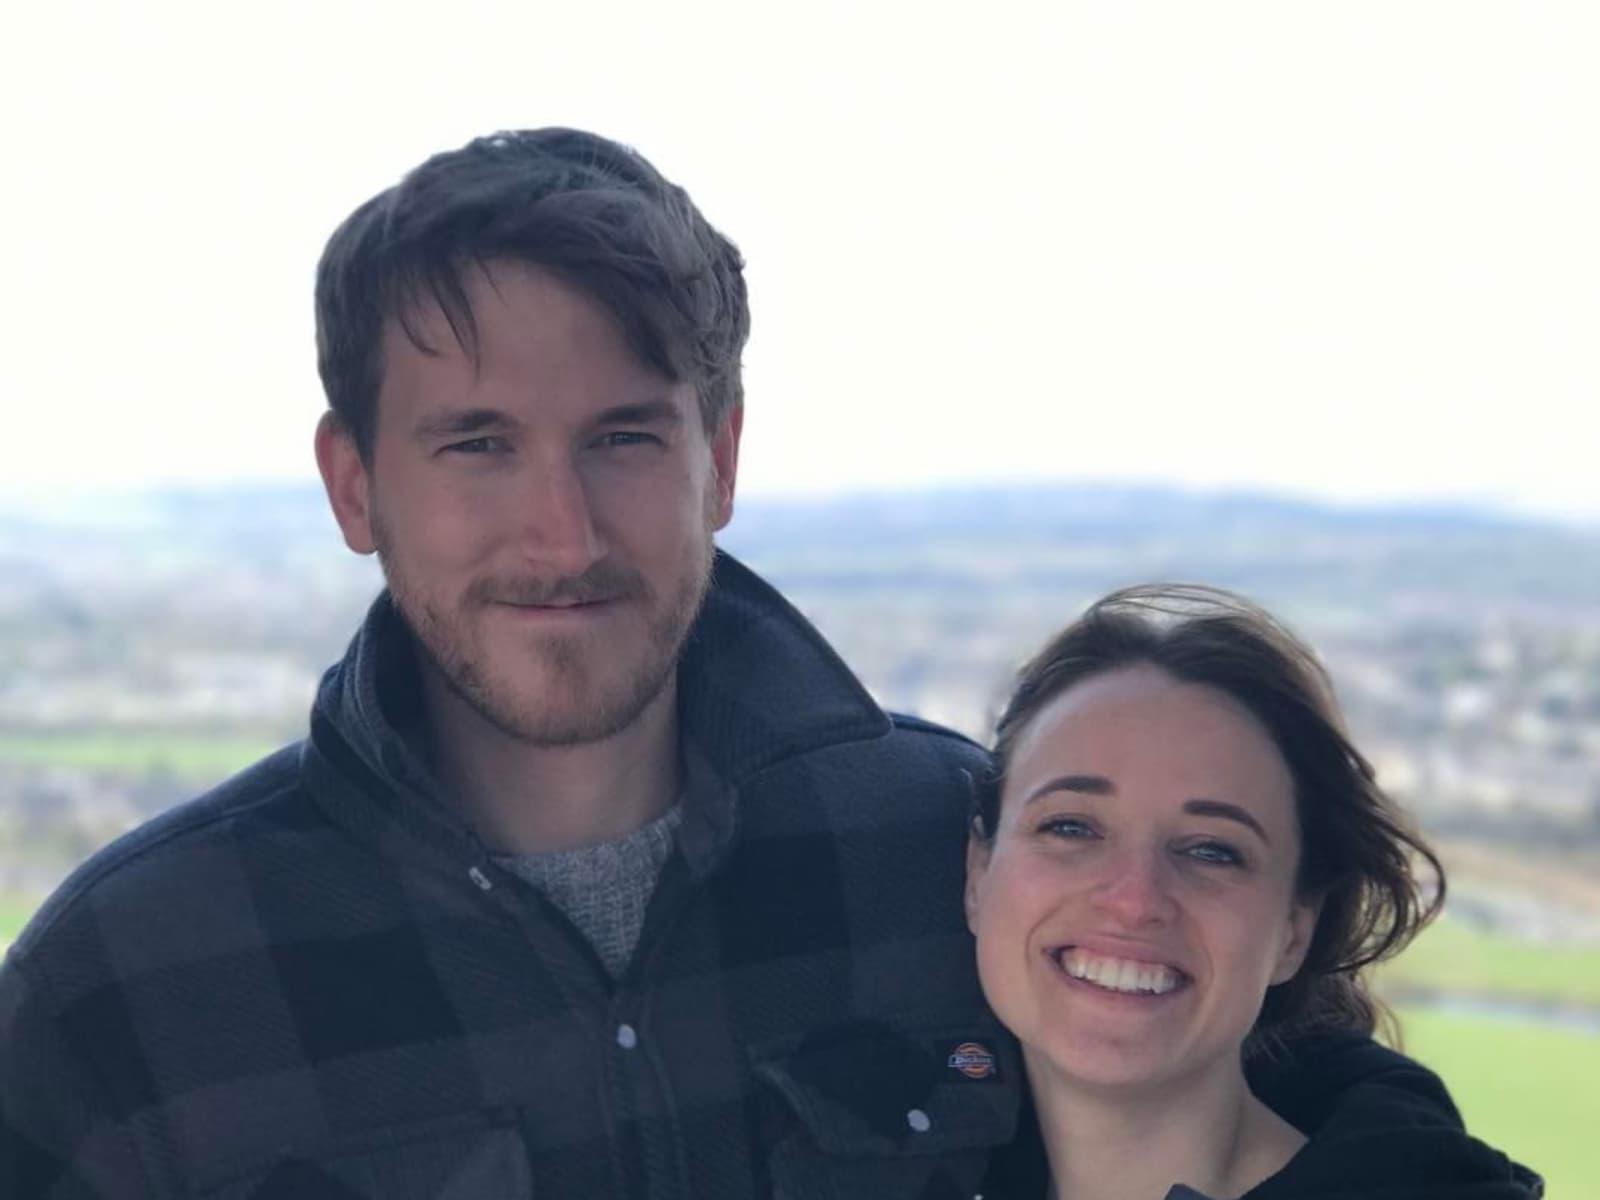 Nicola & James from Calgary, Alberta, Canada